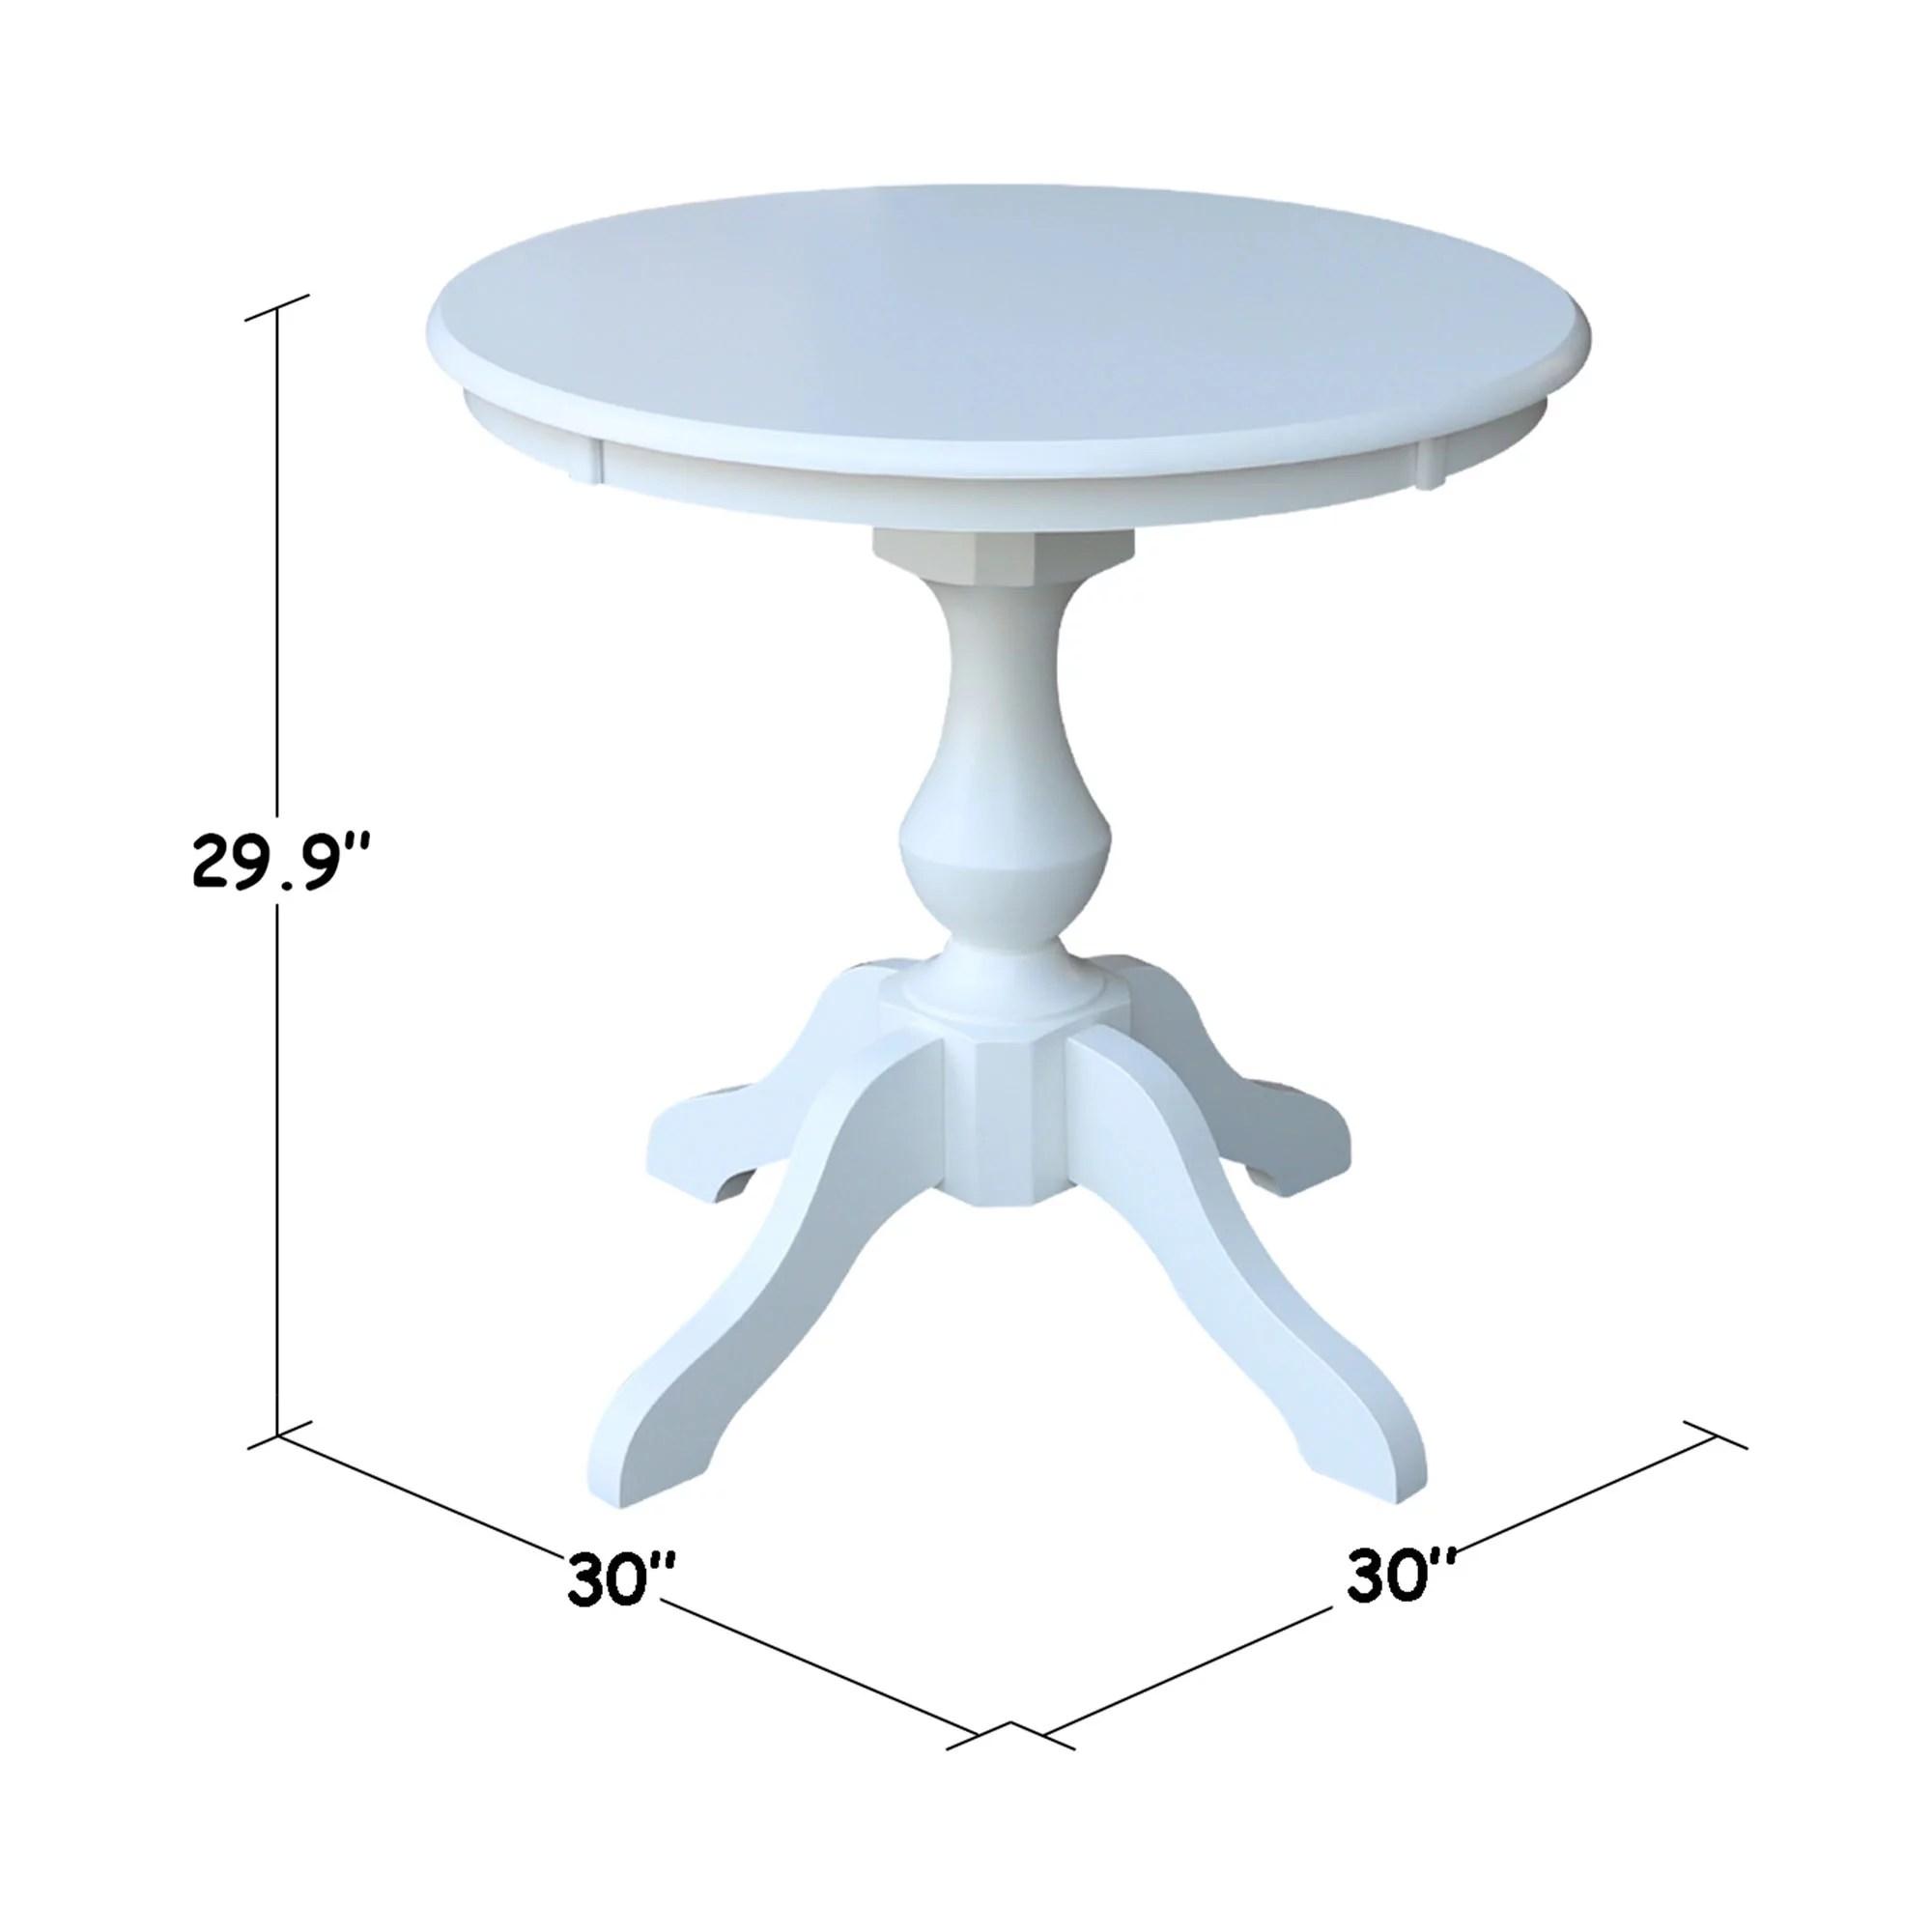 30 Round Top Pedestal Dining Table White Walmart Com Walmart Com